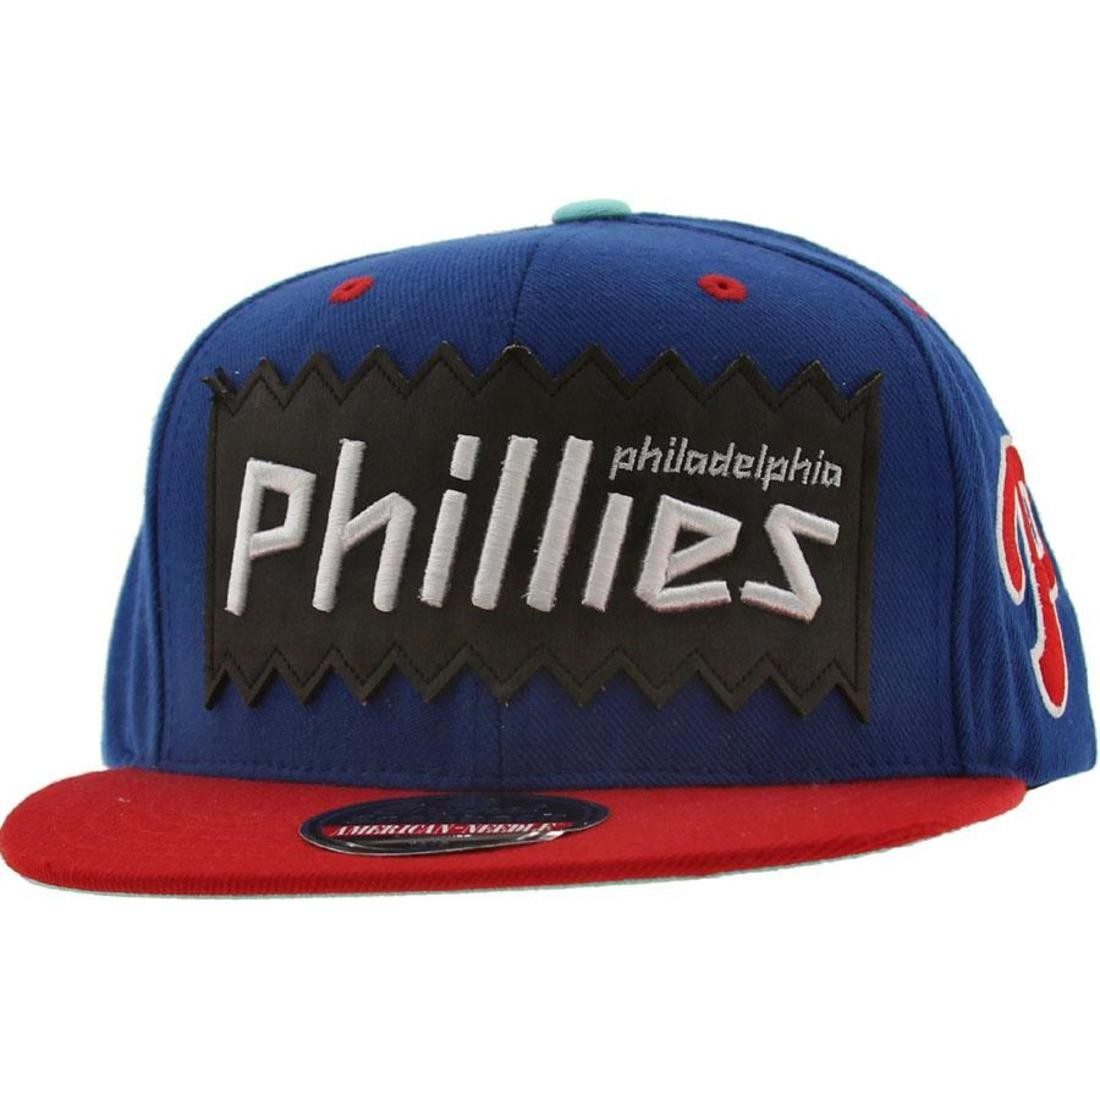 BAIT x MLB x American Needle Philadelphia Phillies Retro Snapback Cap (royal / red)